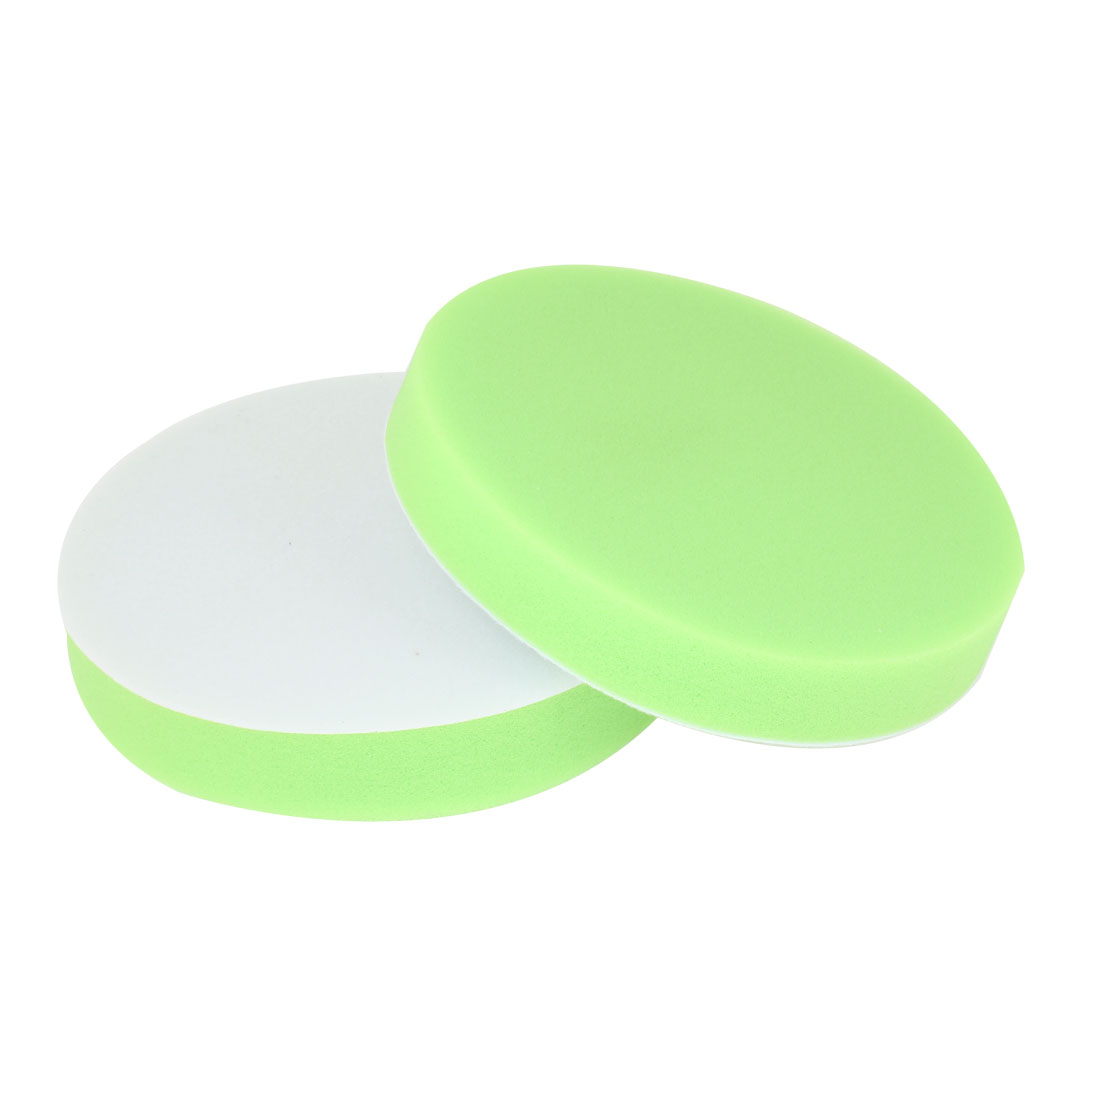 2 Pcs Green Soft Sponge Wax Waxing Polishing Wheel 14.8cm Dia for Auto